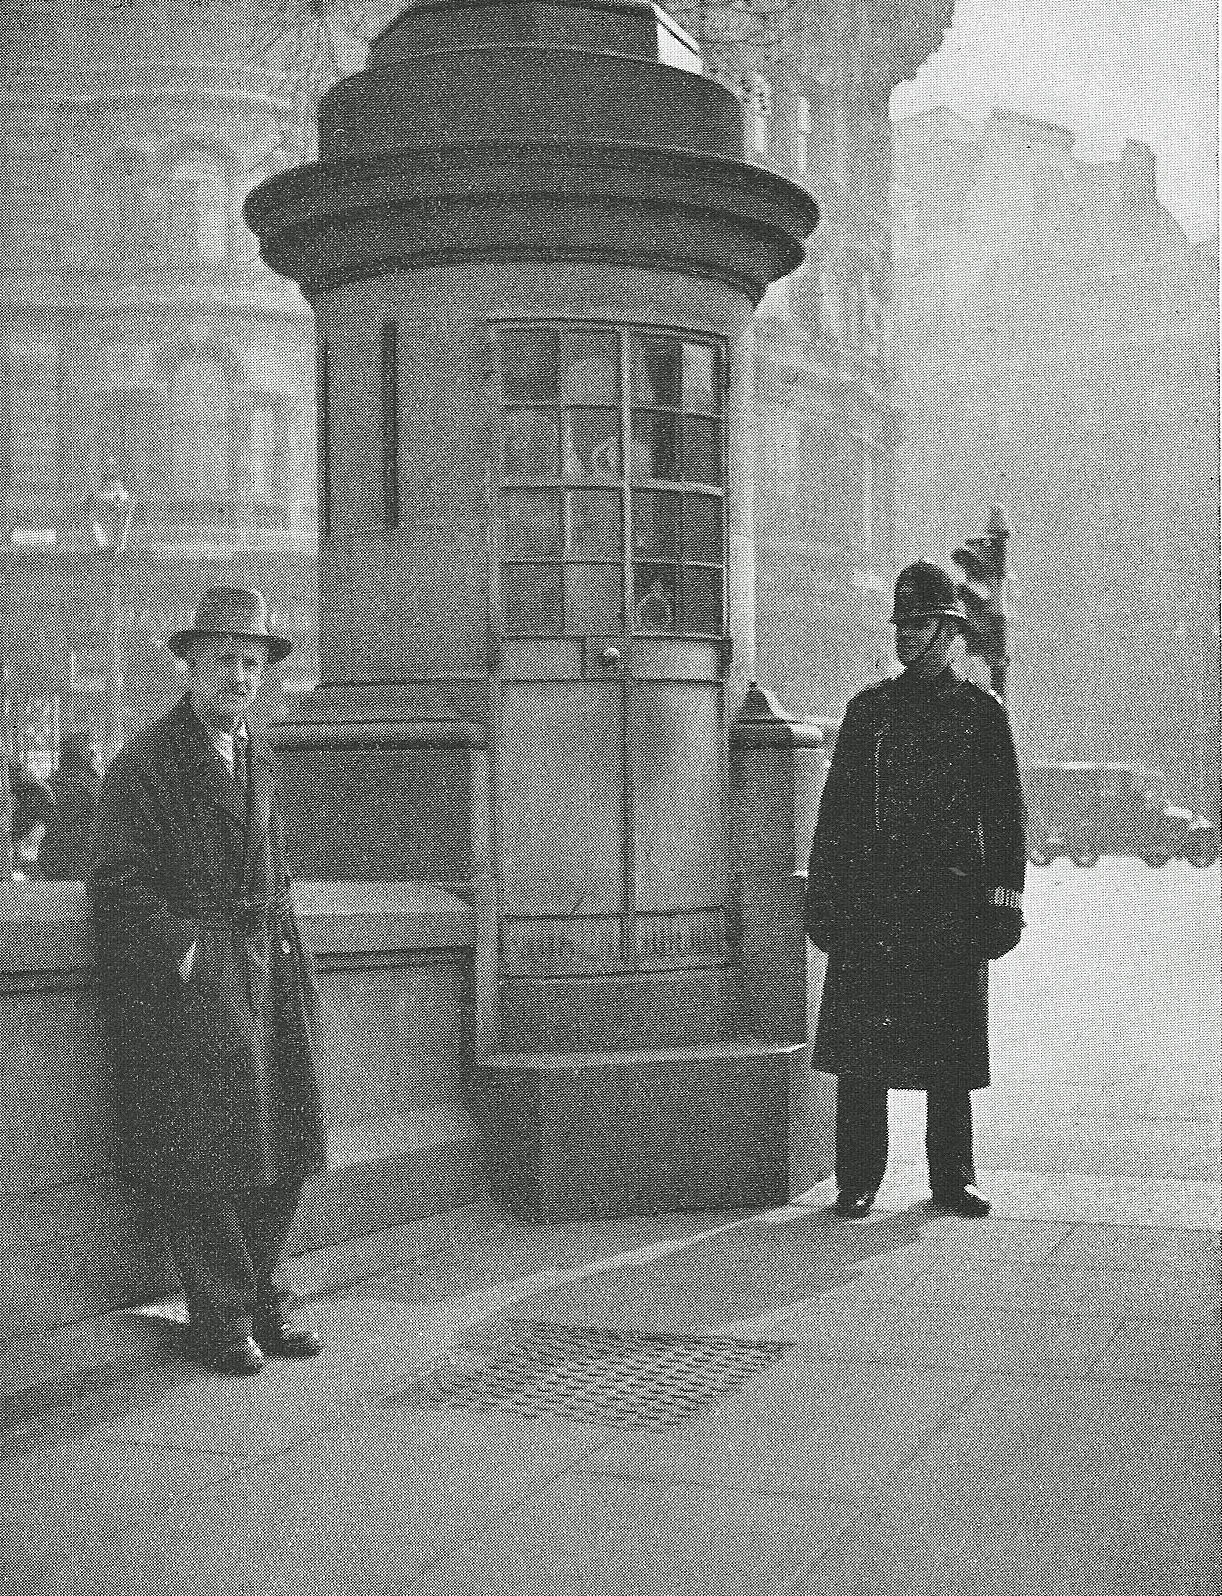 trafalgar square police observation box 1920s